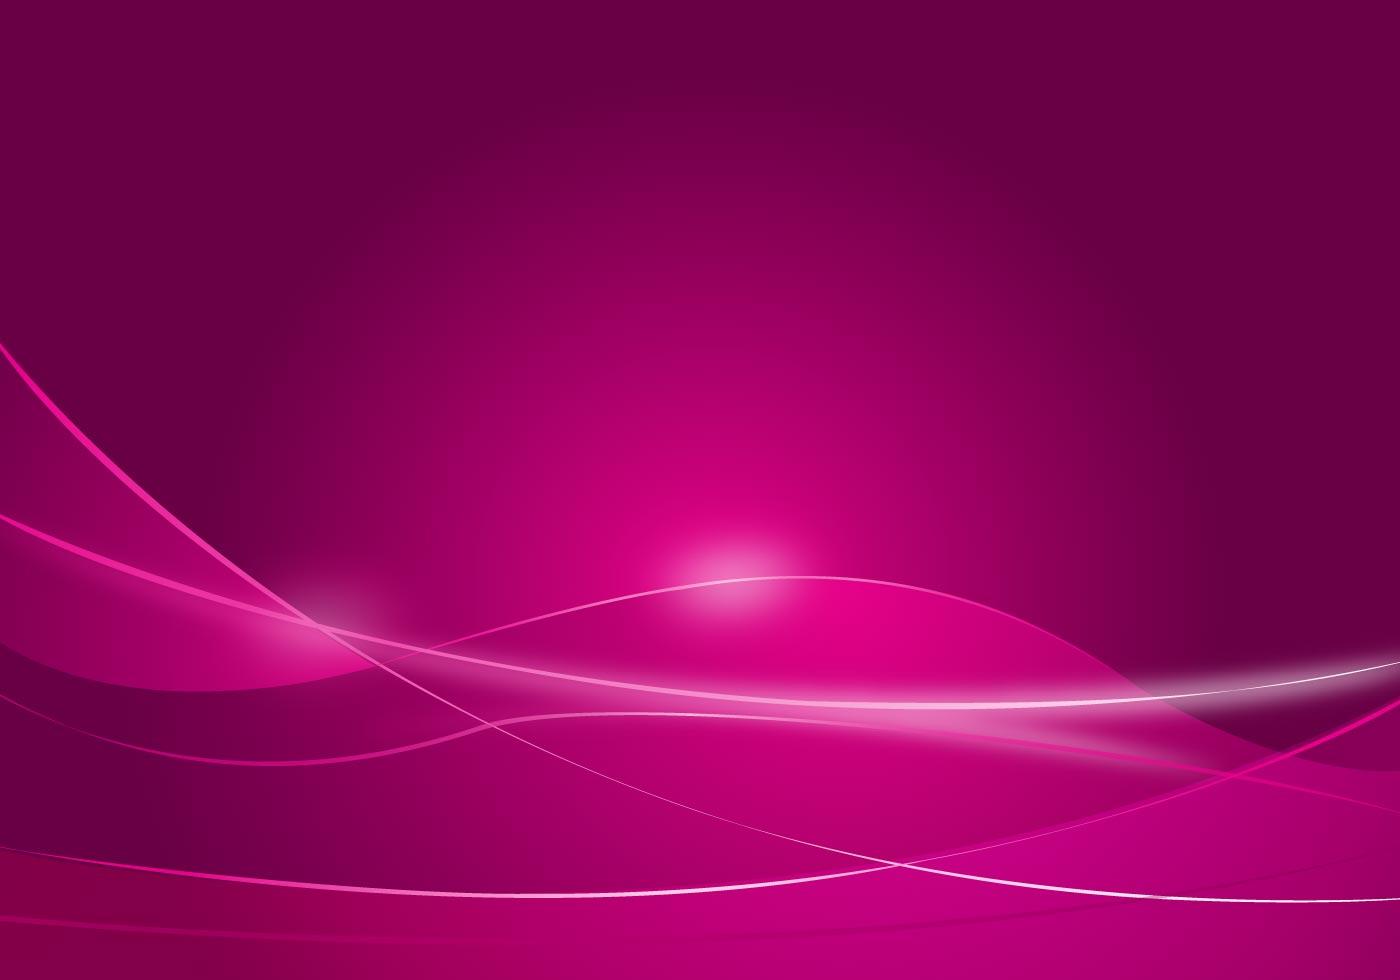 Fuchsia Background Download Free Vector Art Stock